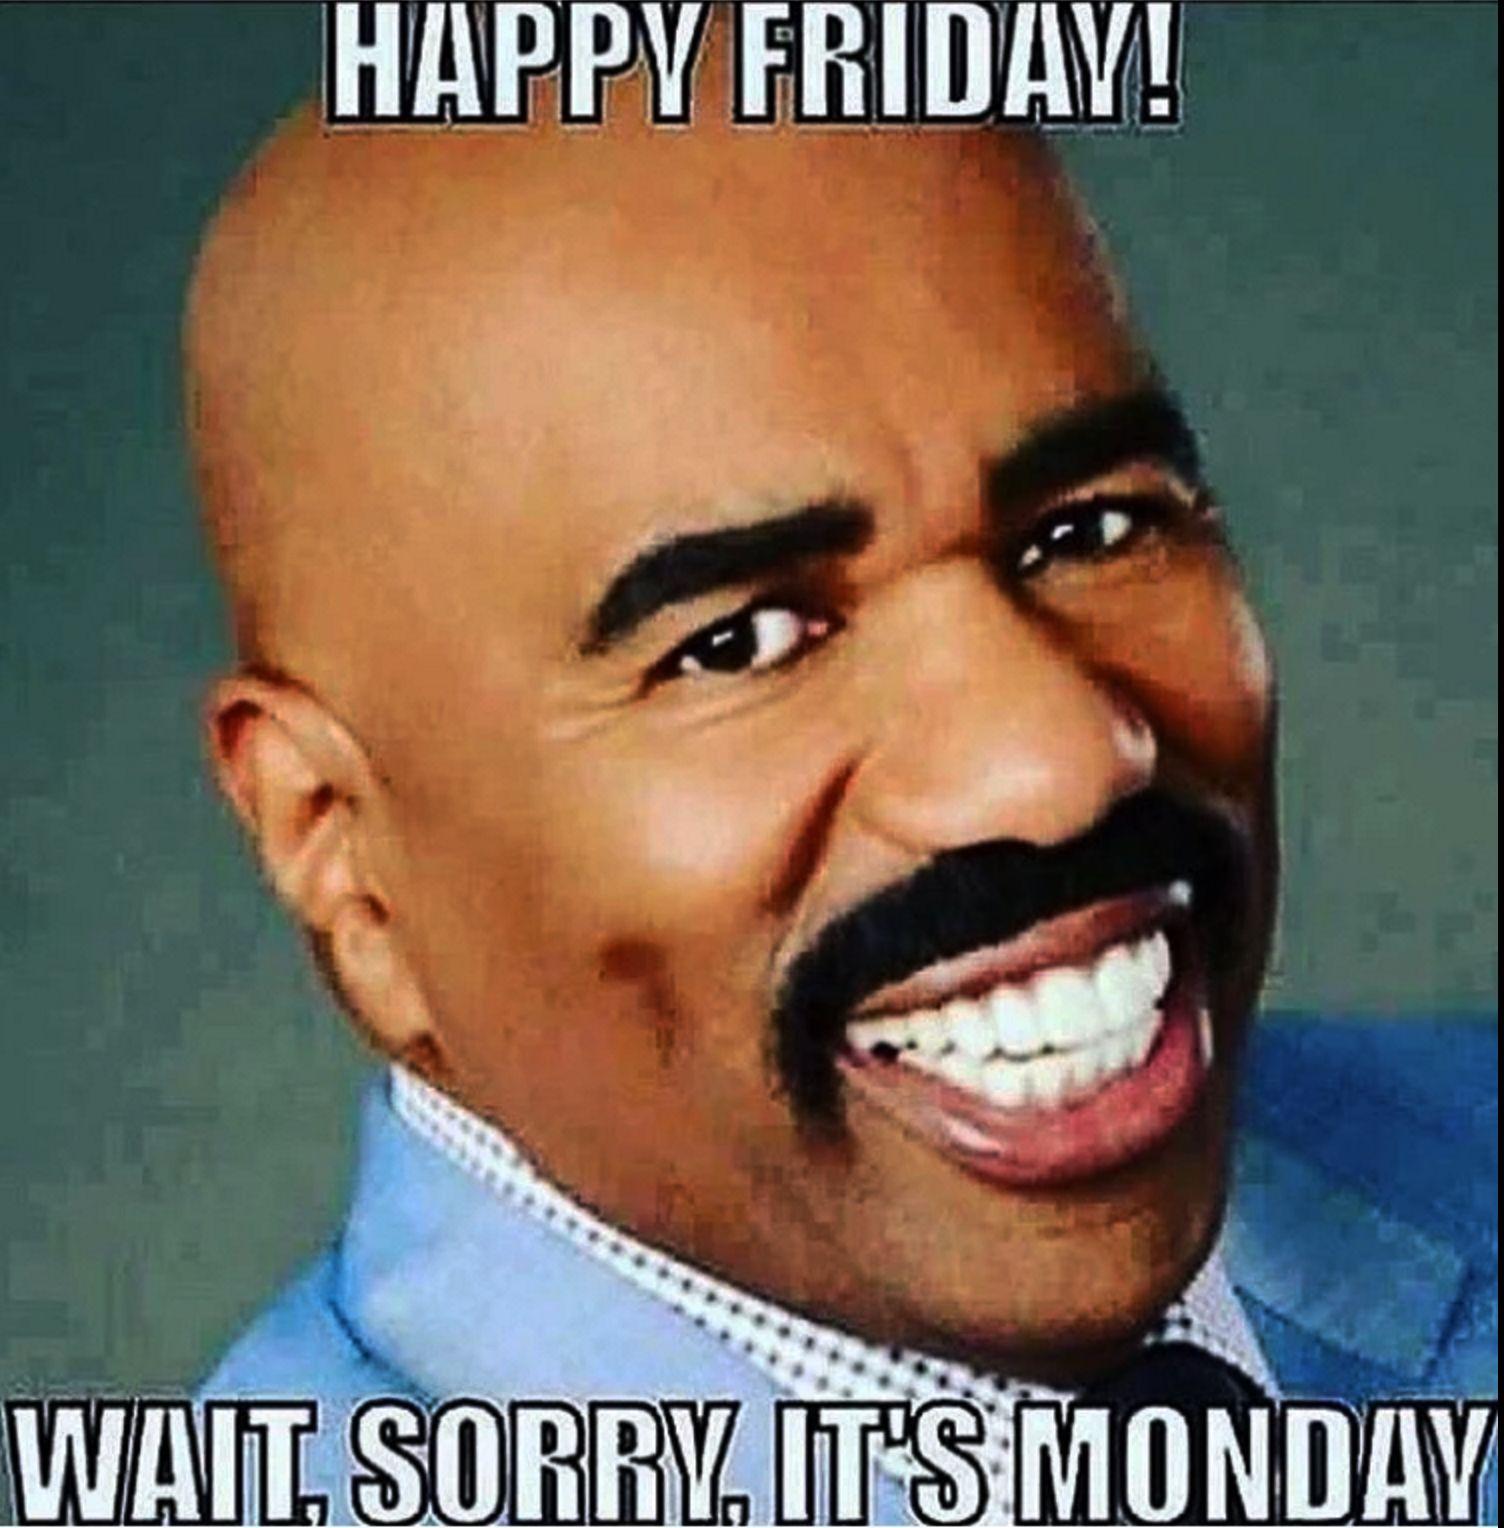 59cbe1687b125c3f6f393396d2587ce0 happyfriday on a monday everyone! lol steveharvey